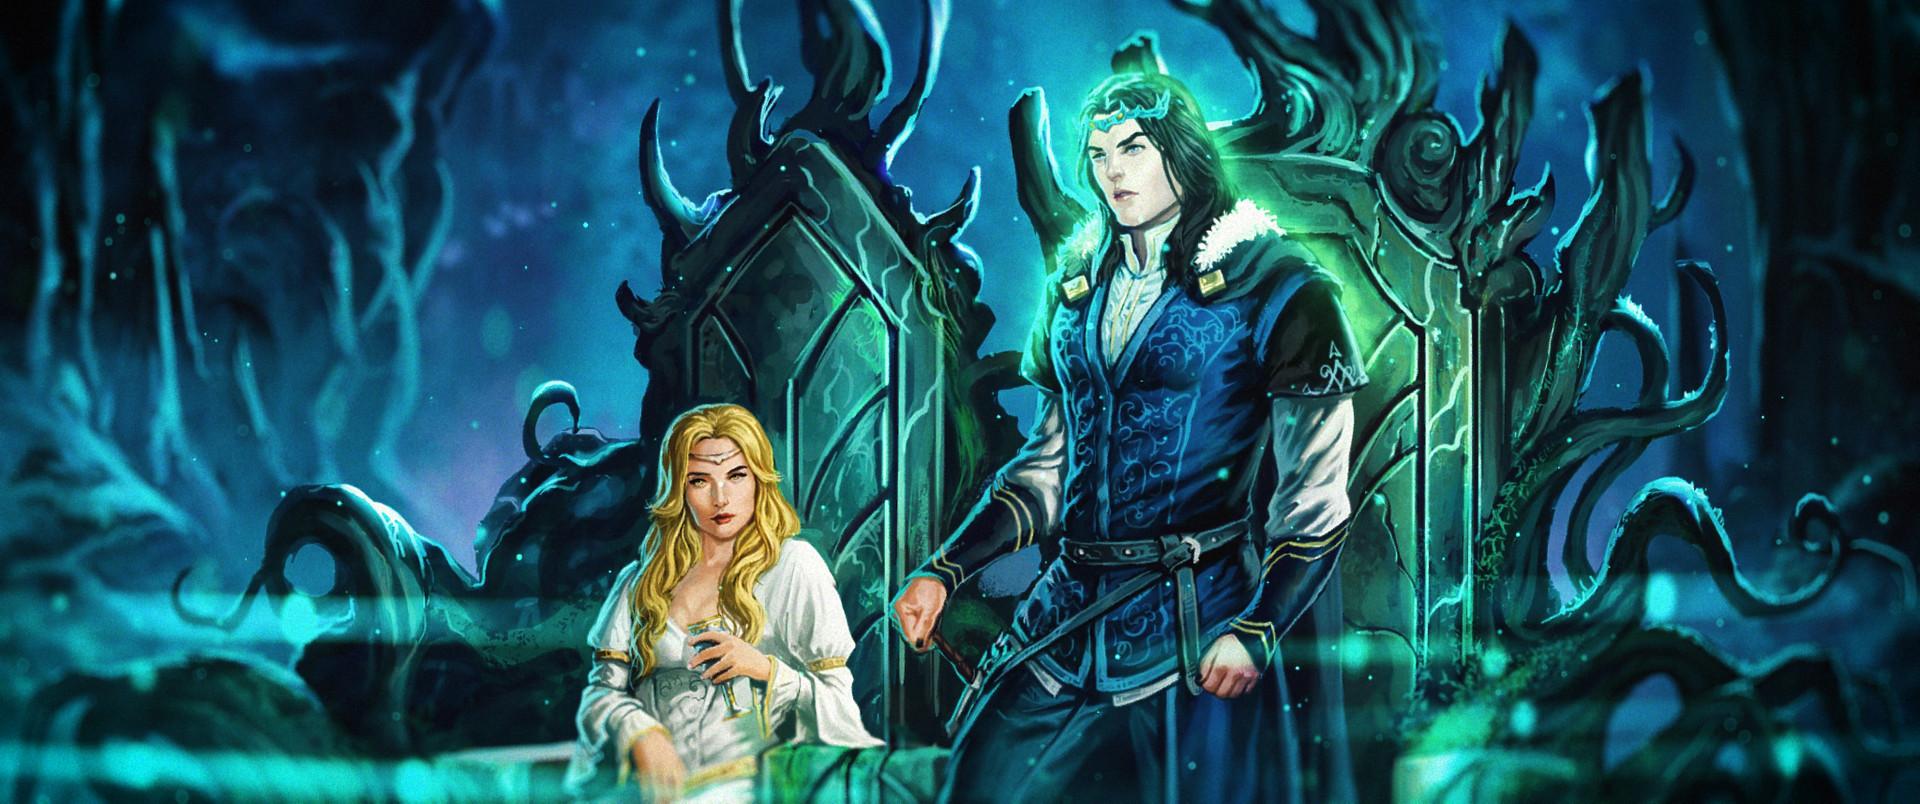 Joshua ezzell magnus and lila 1 0 00 01 12